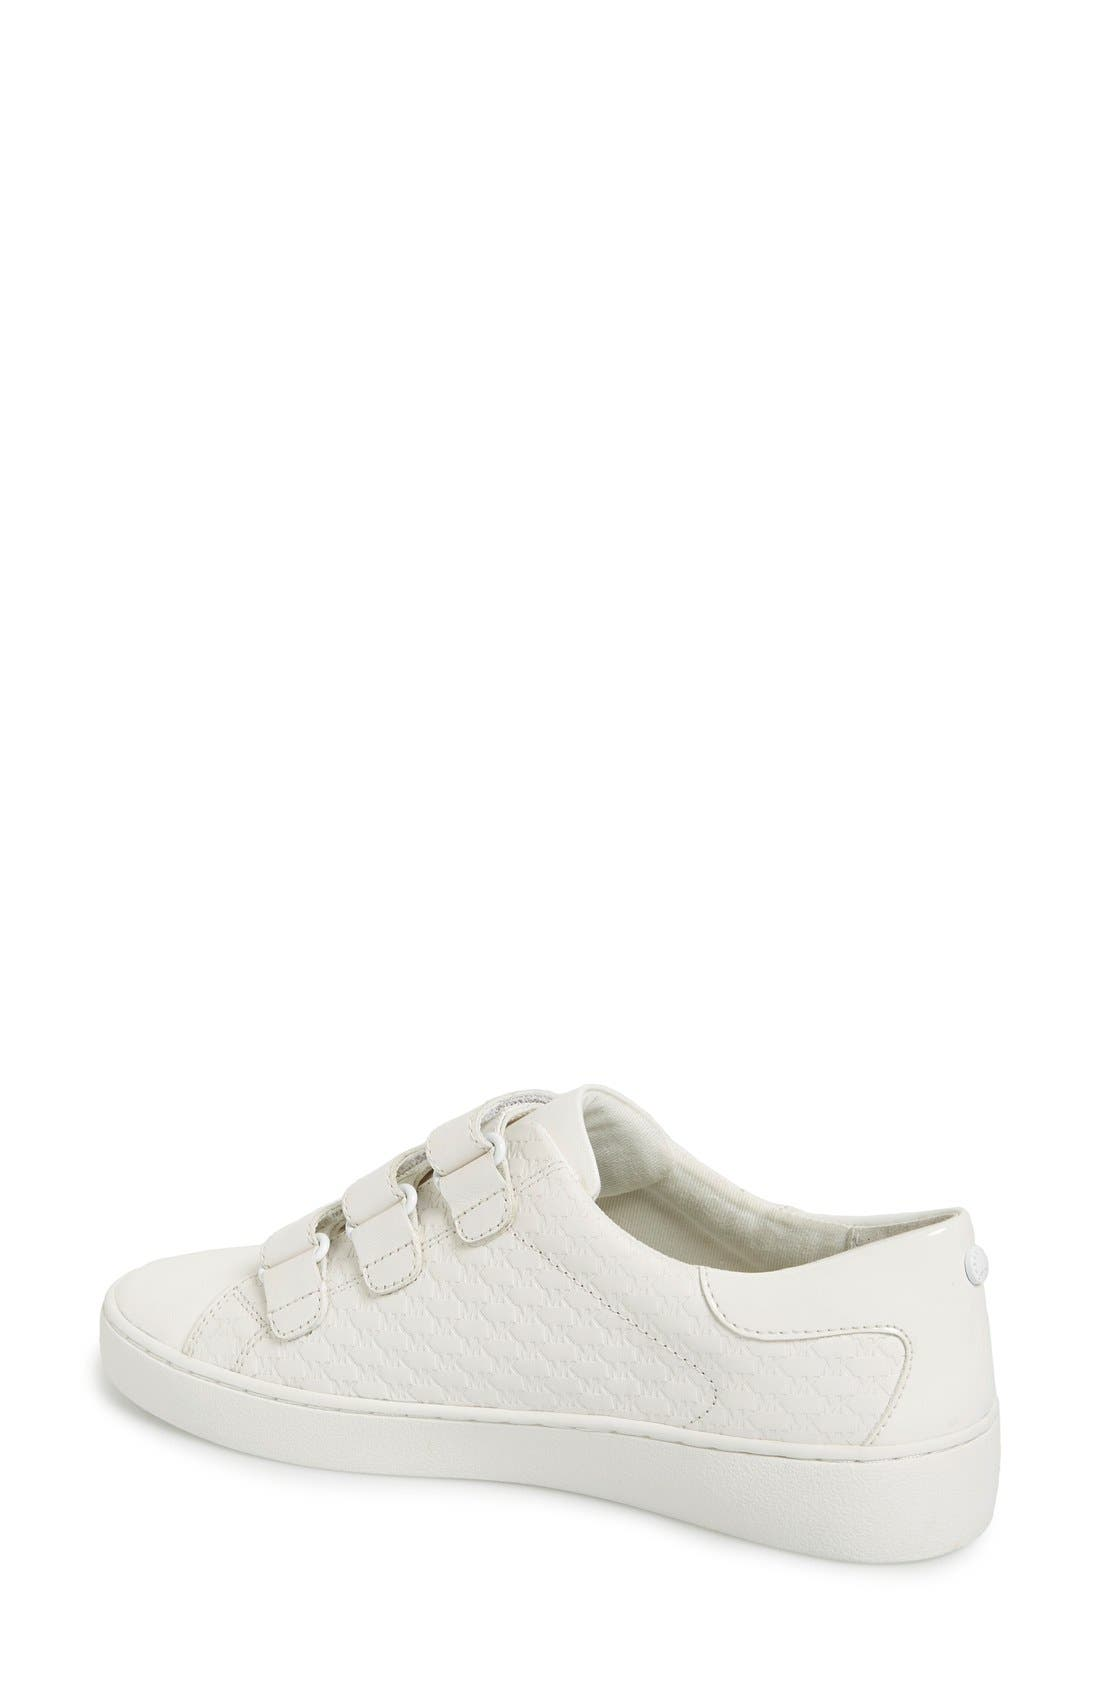 Alternate Image 2  - MICHAEL Michael Kors 'Craig' Sneaker (Women)